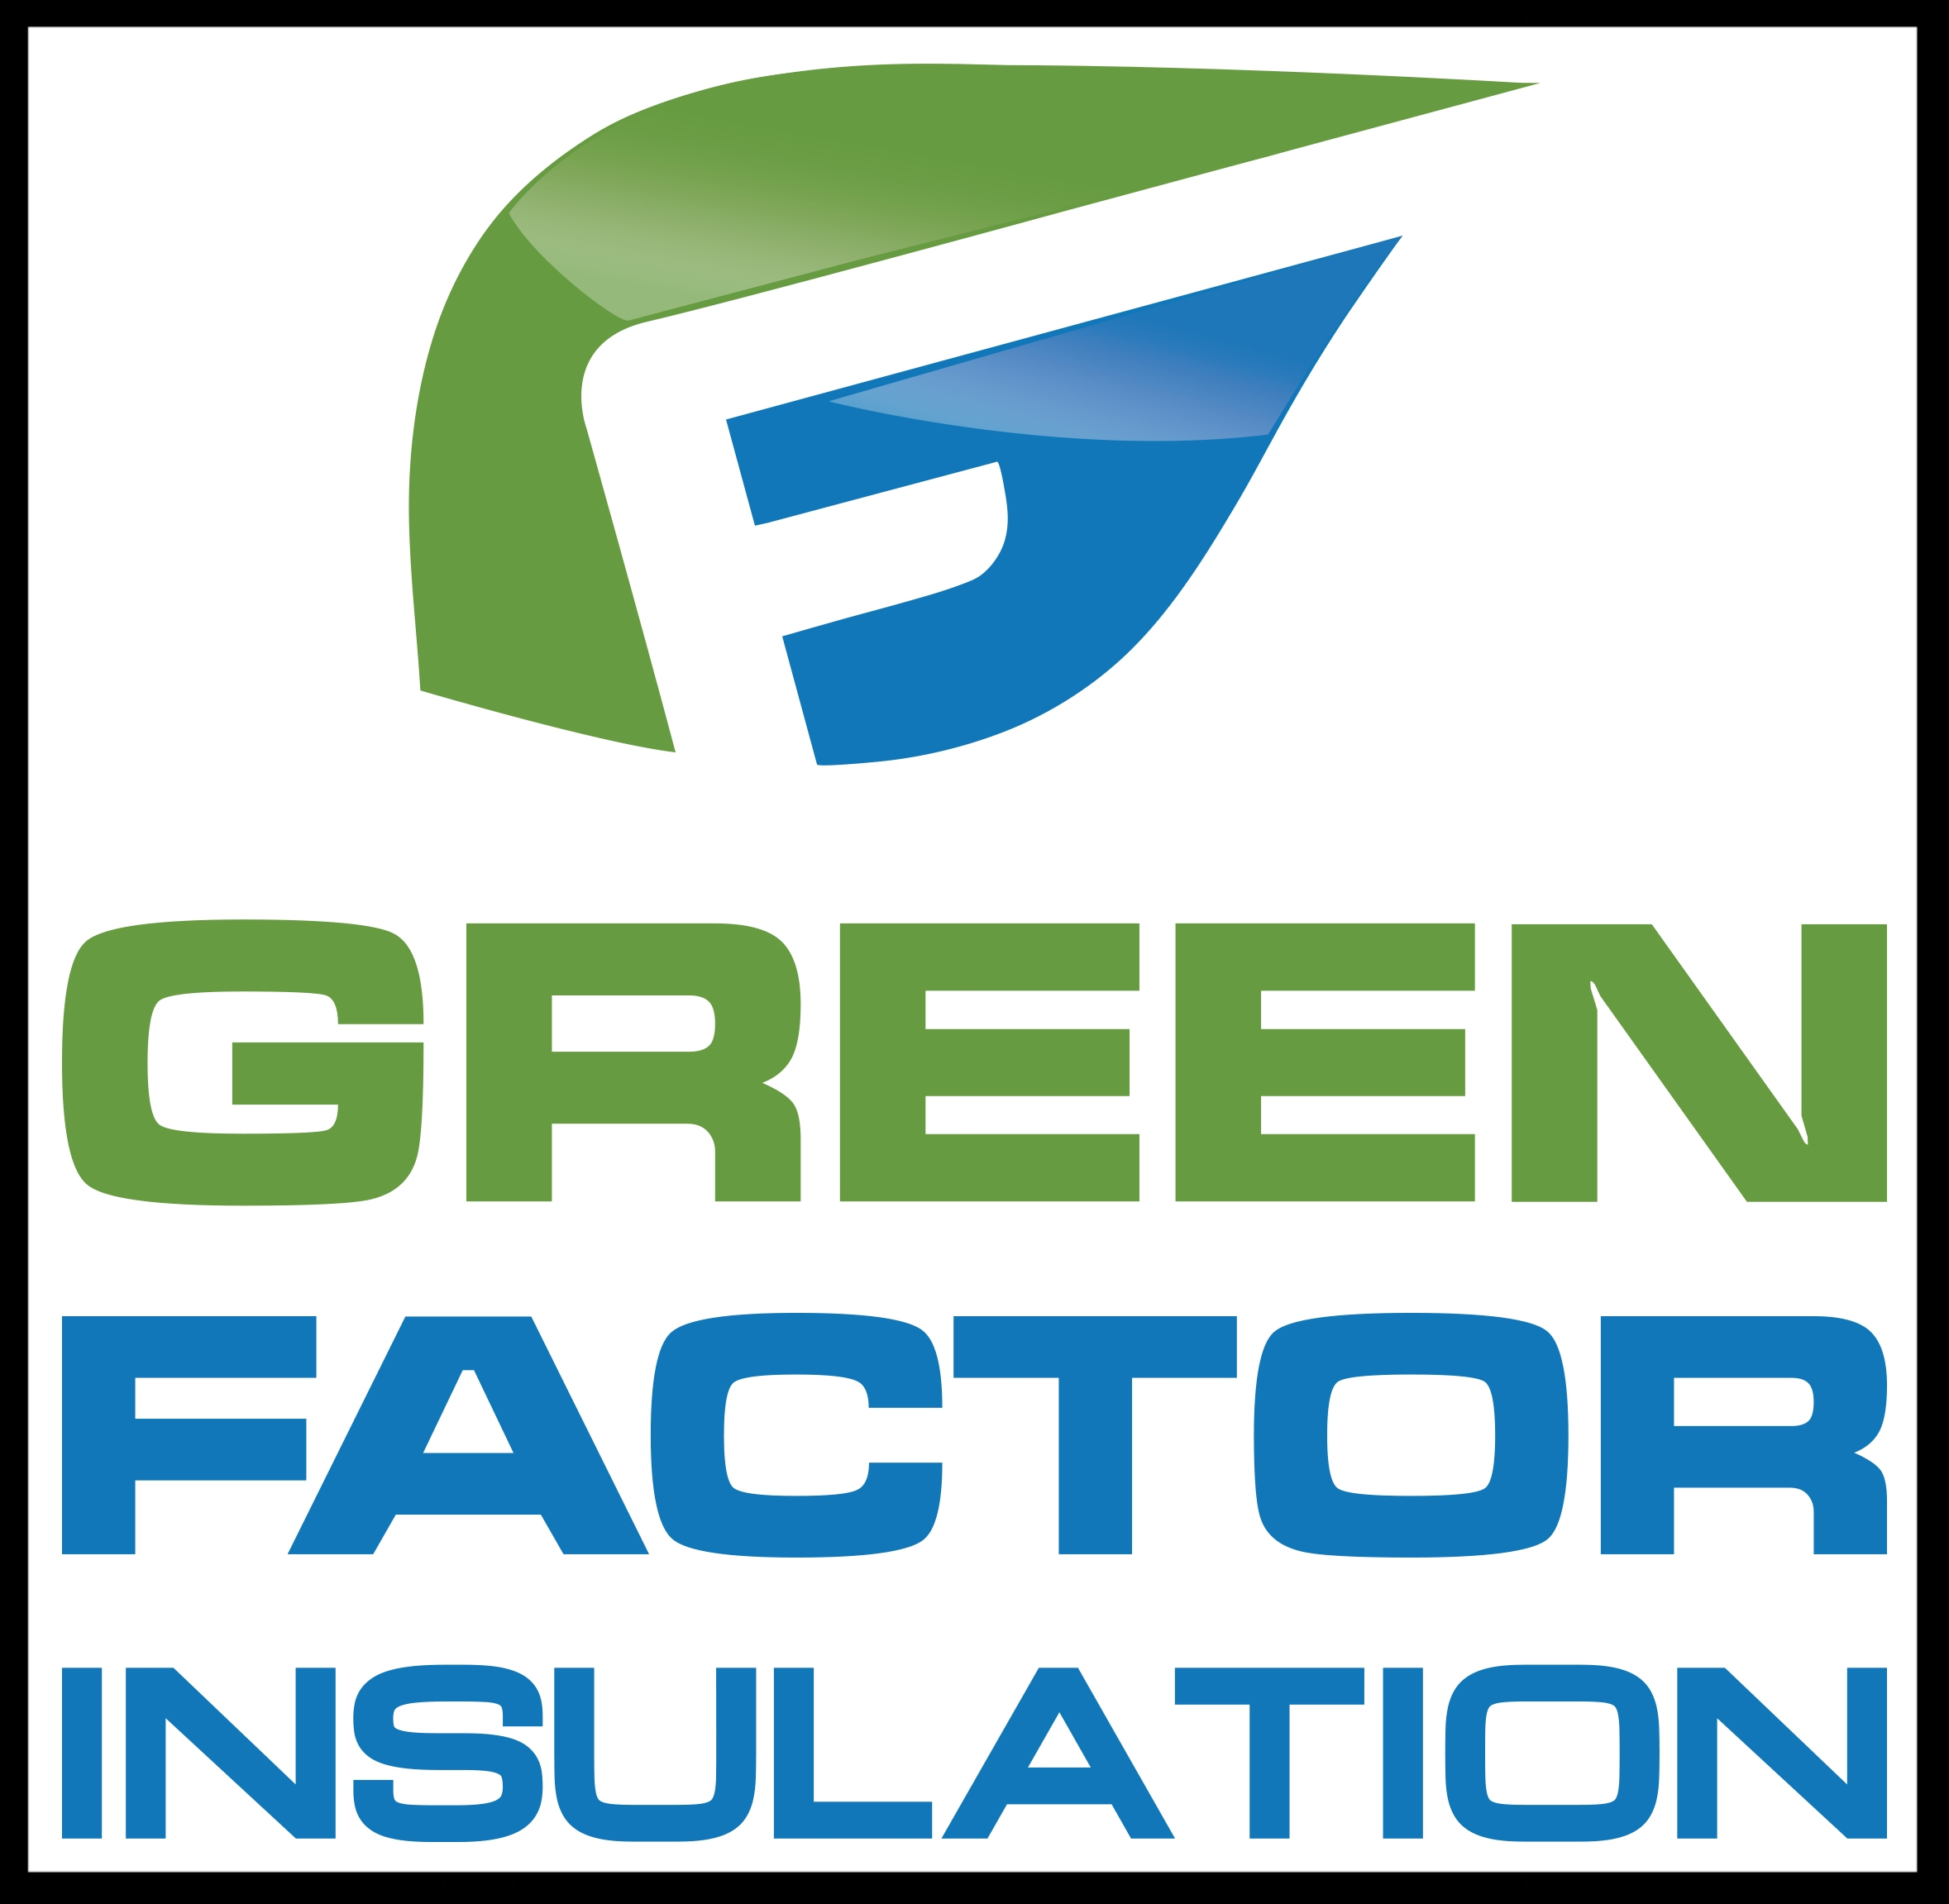 green_factor_logo_Stacked_Raster_Color.jpg